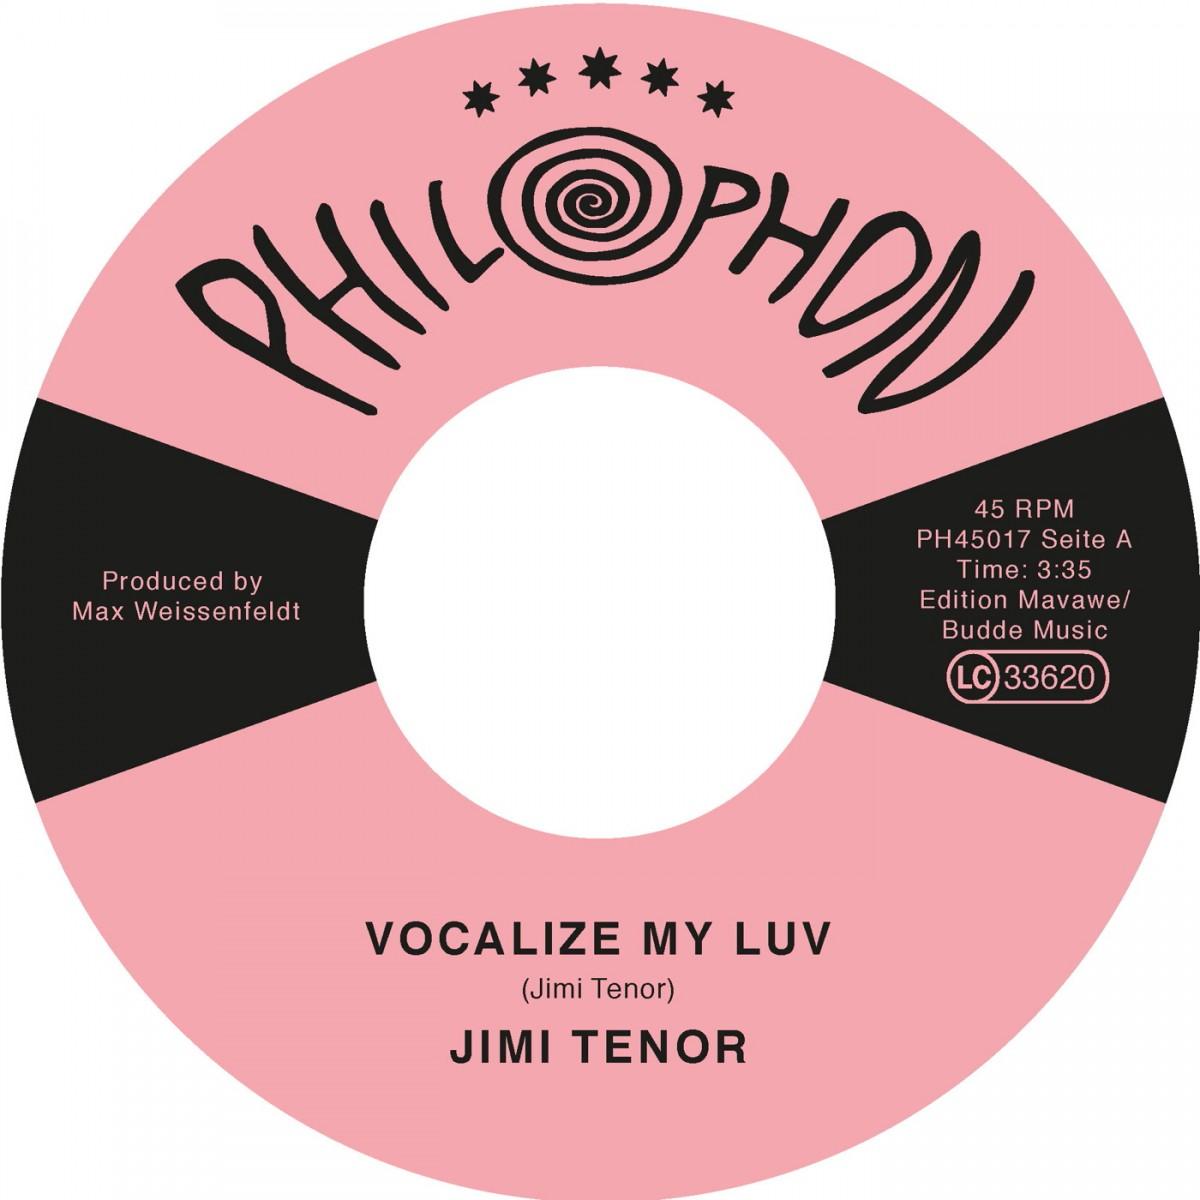 Vocalize My Luv - Jimi Tenor